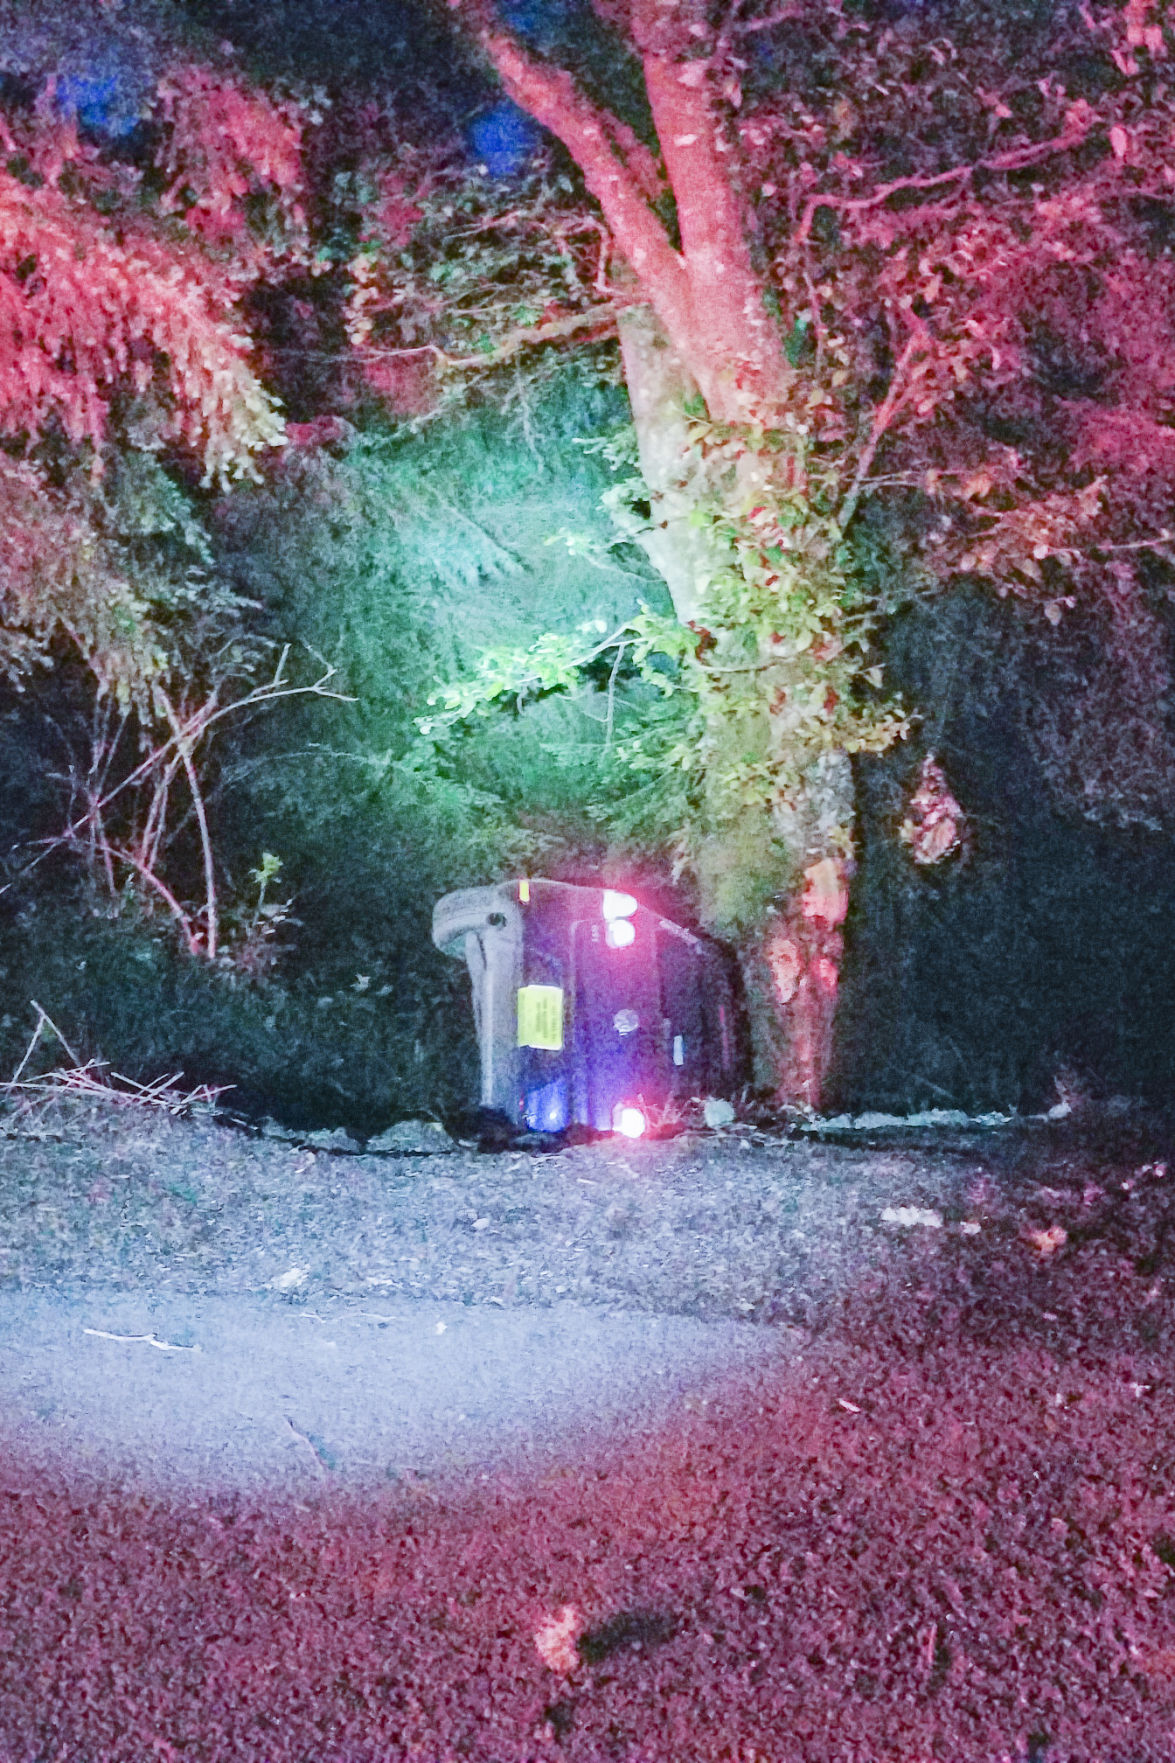 Westport man dies in Highway 30 crash | Local News